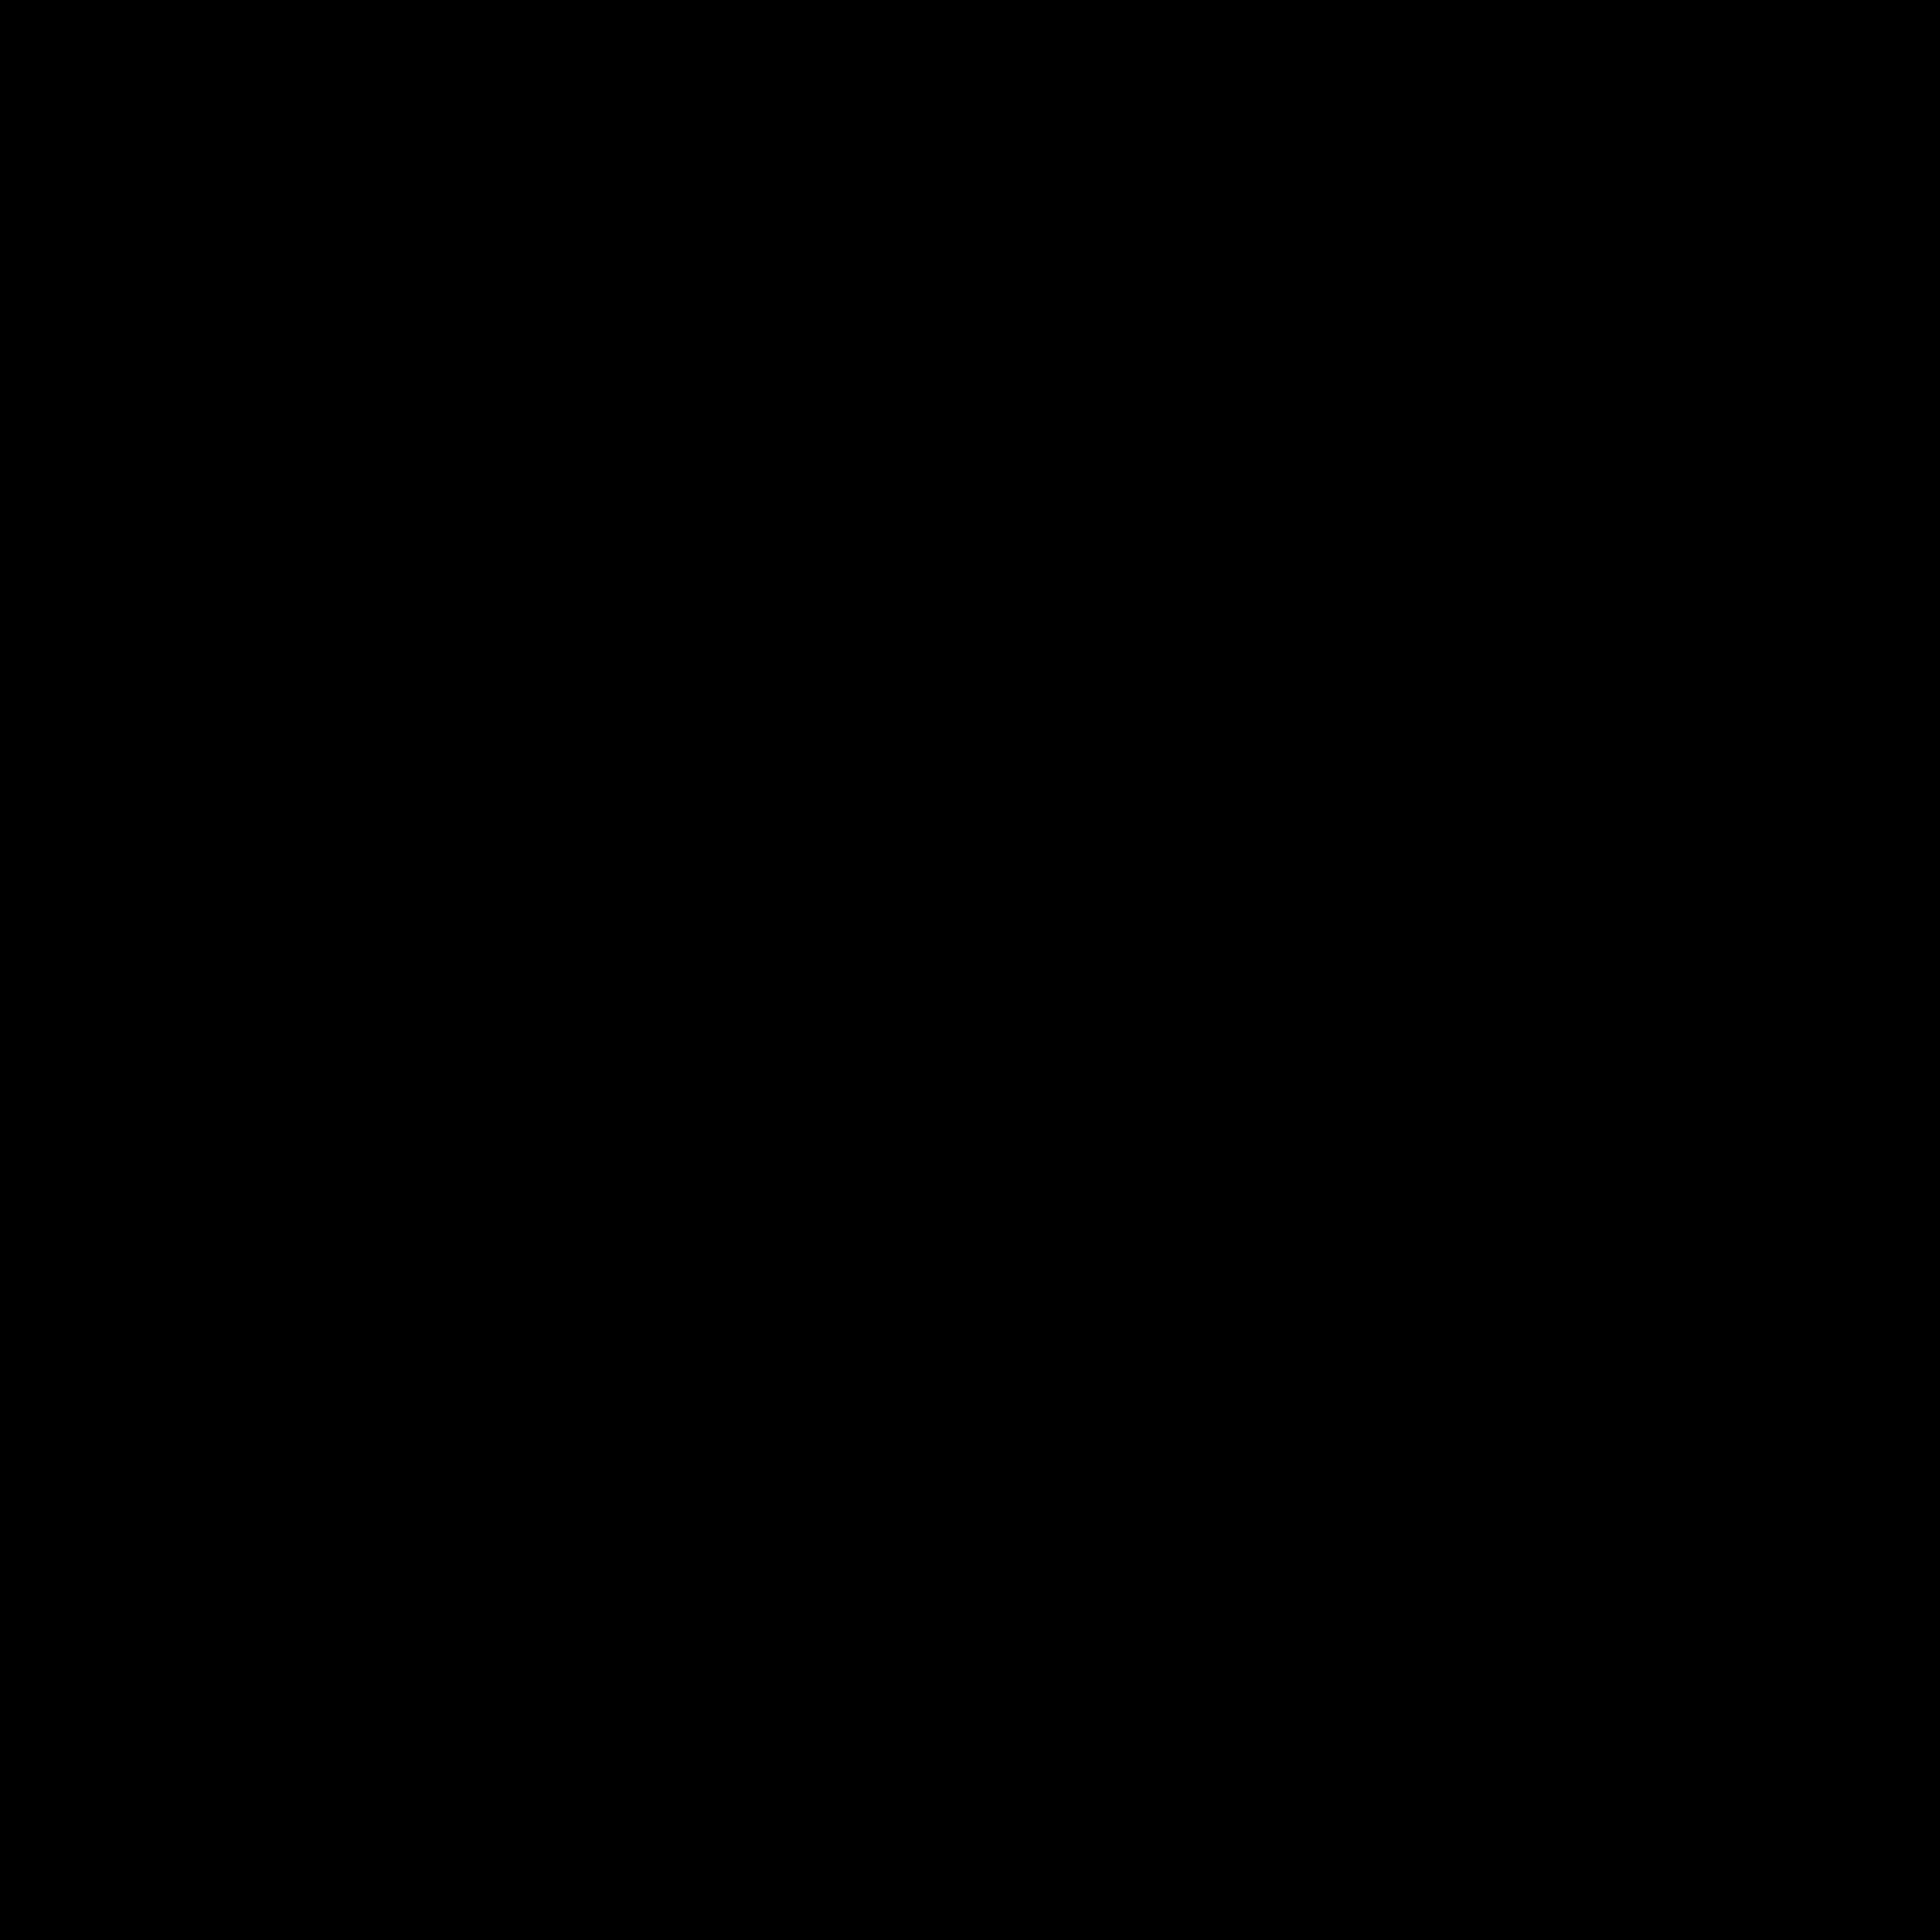 Reddit Png Clipart PNG Image Free Download